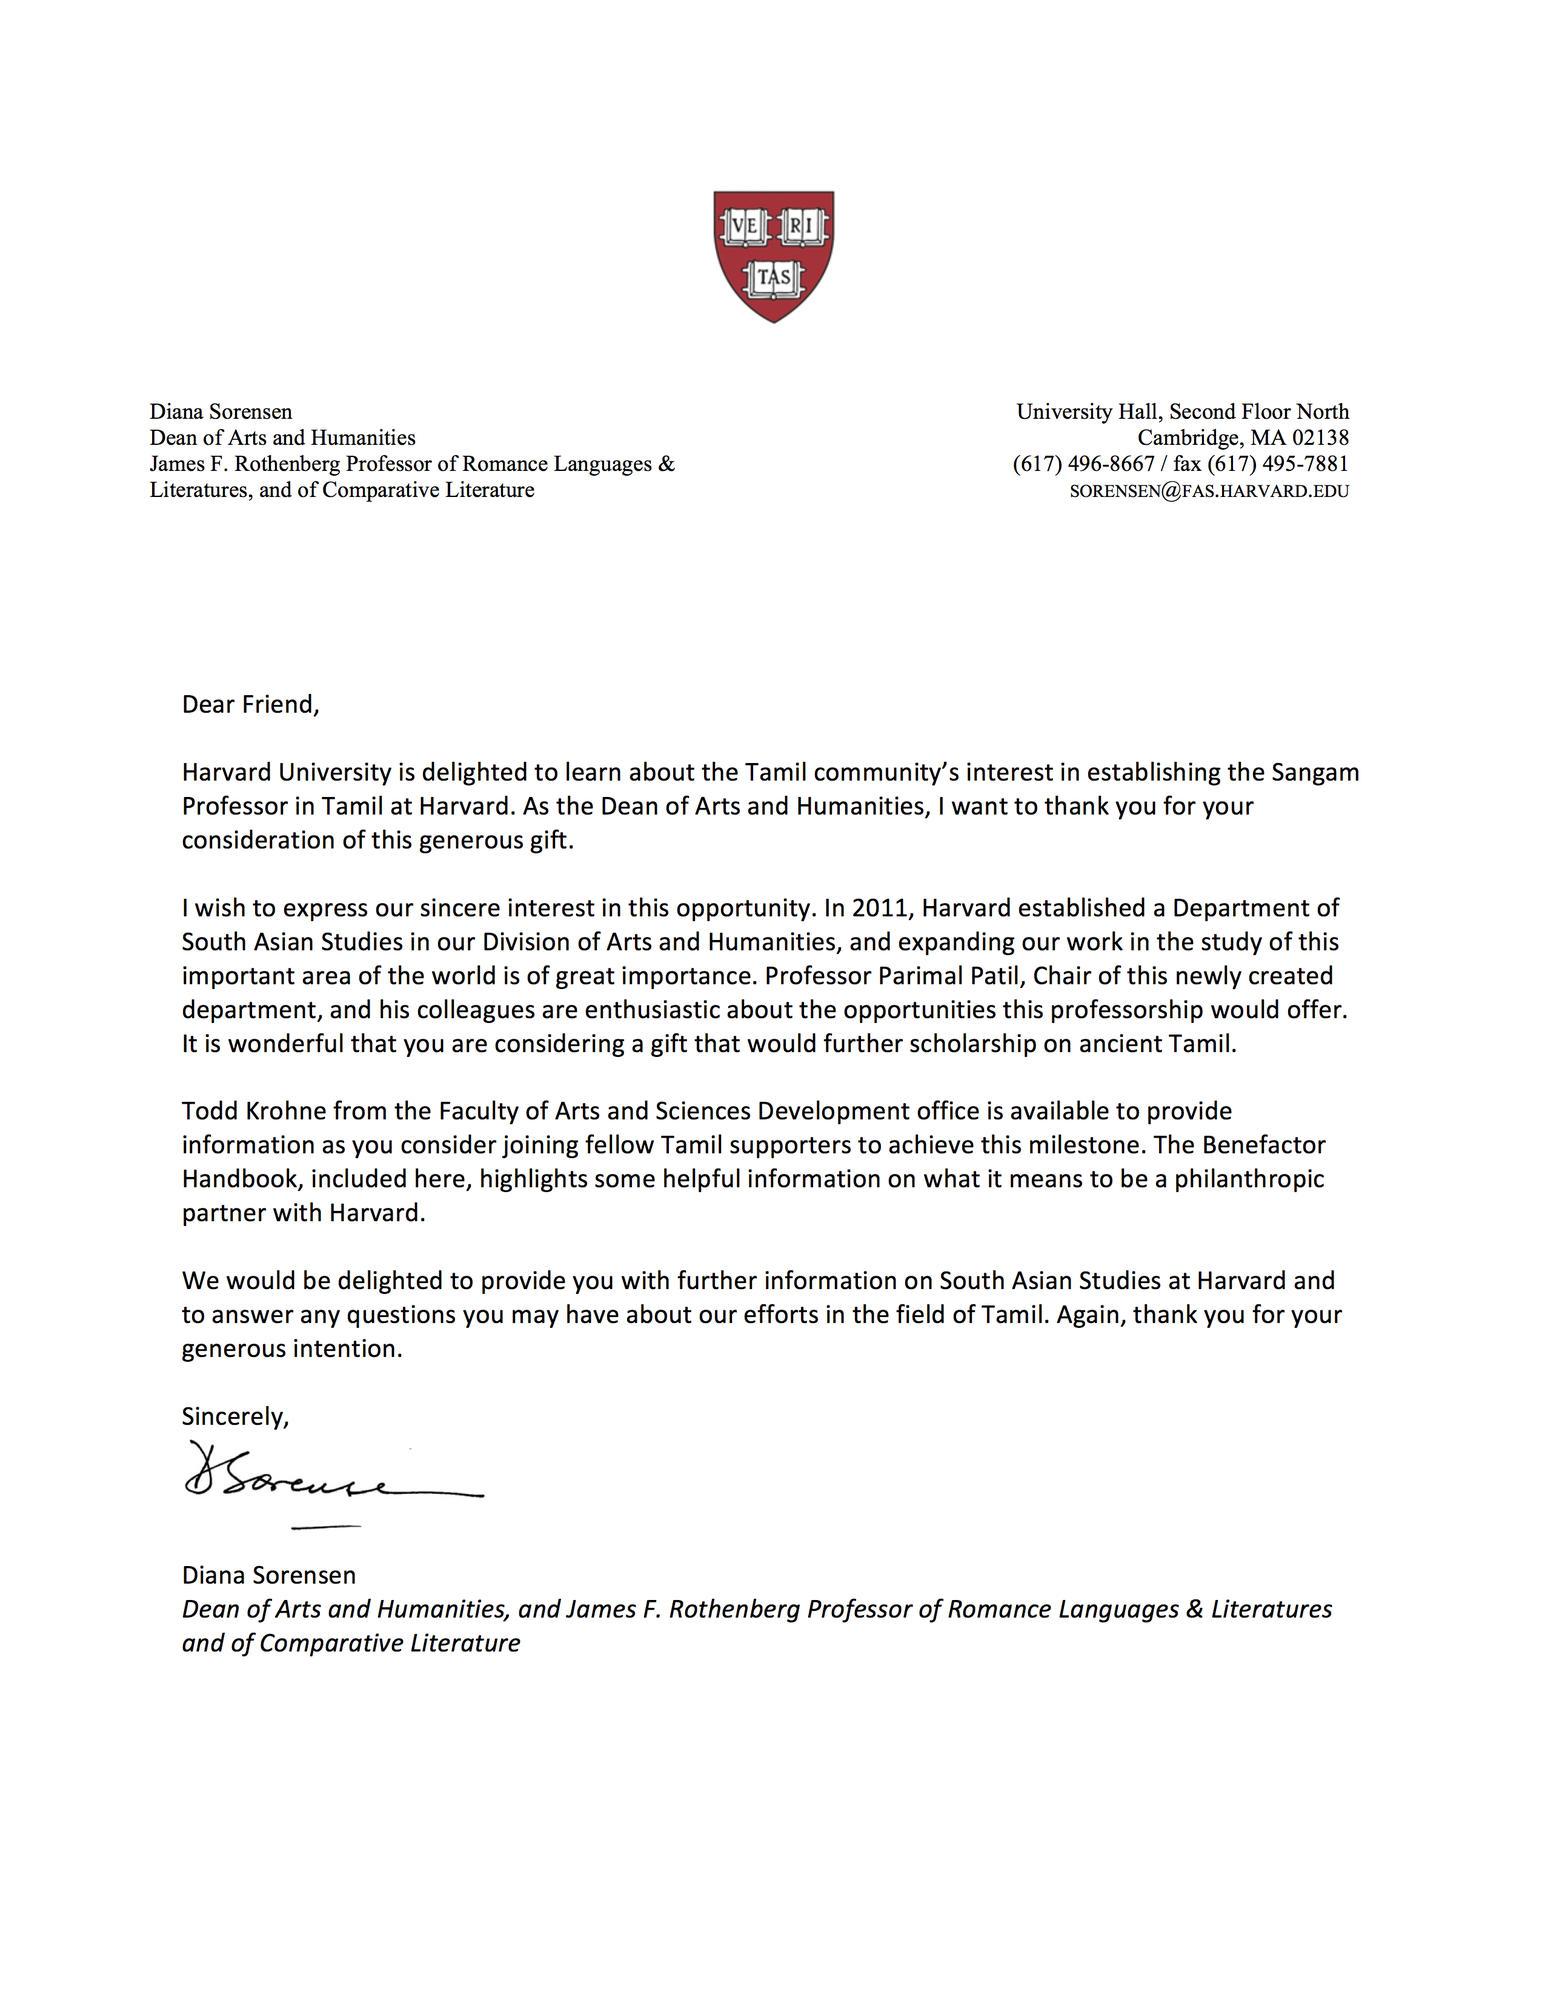 Overview Sangam Professorship In Tamil At Harvard University